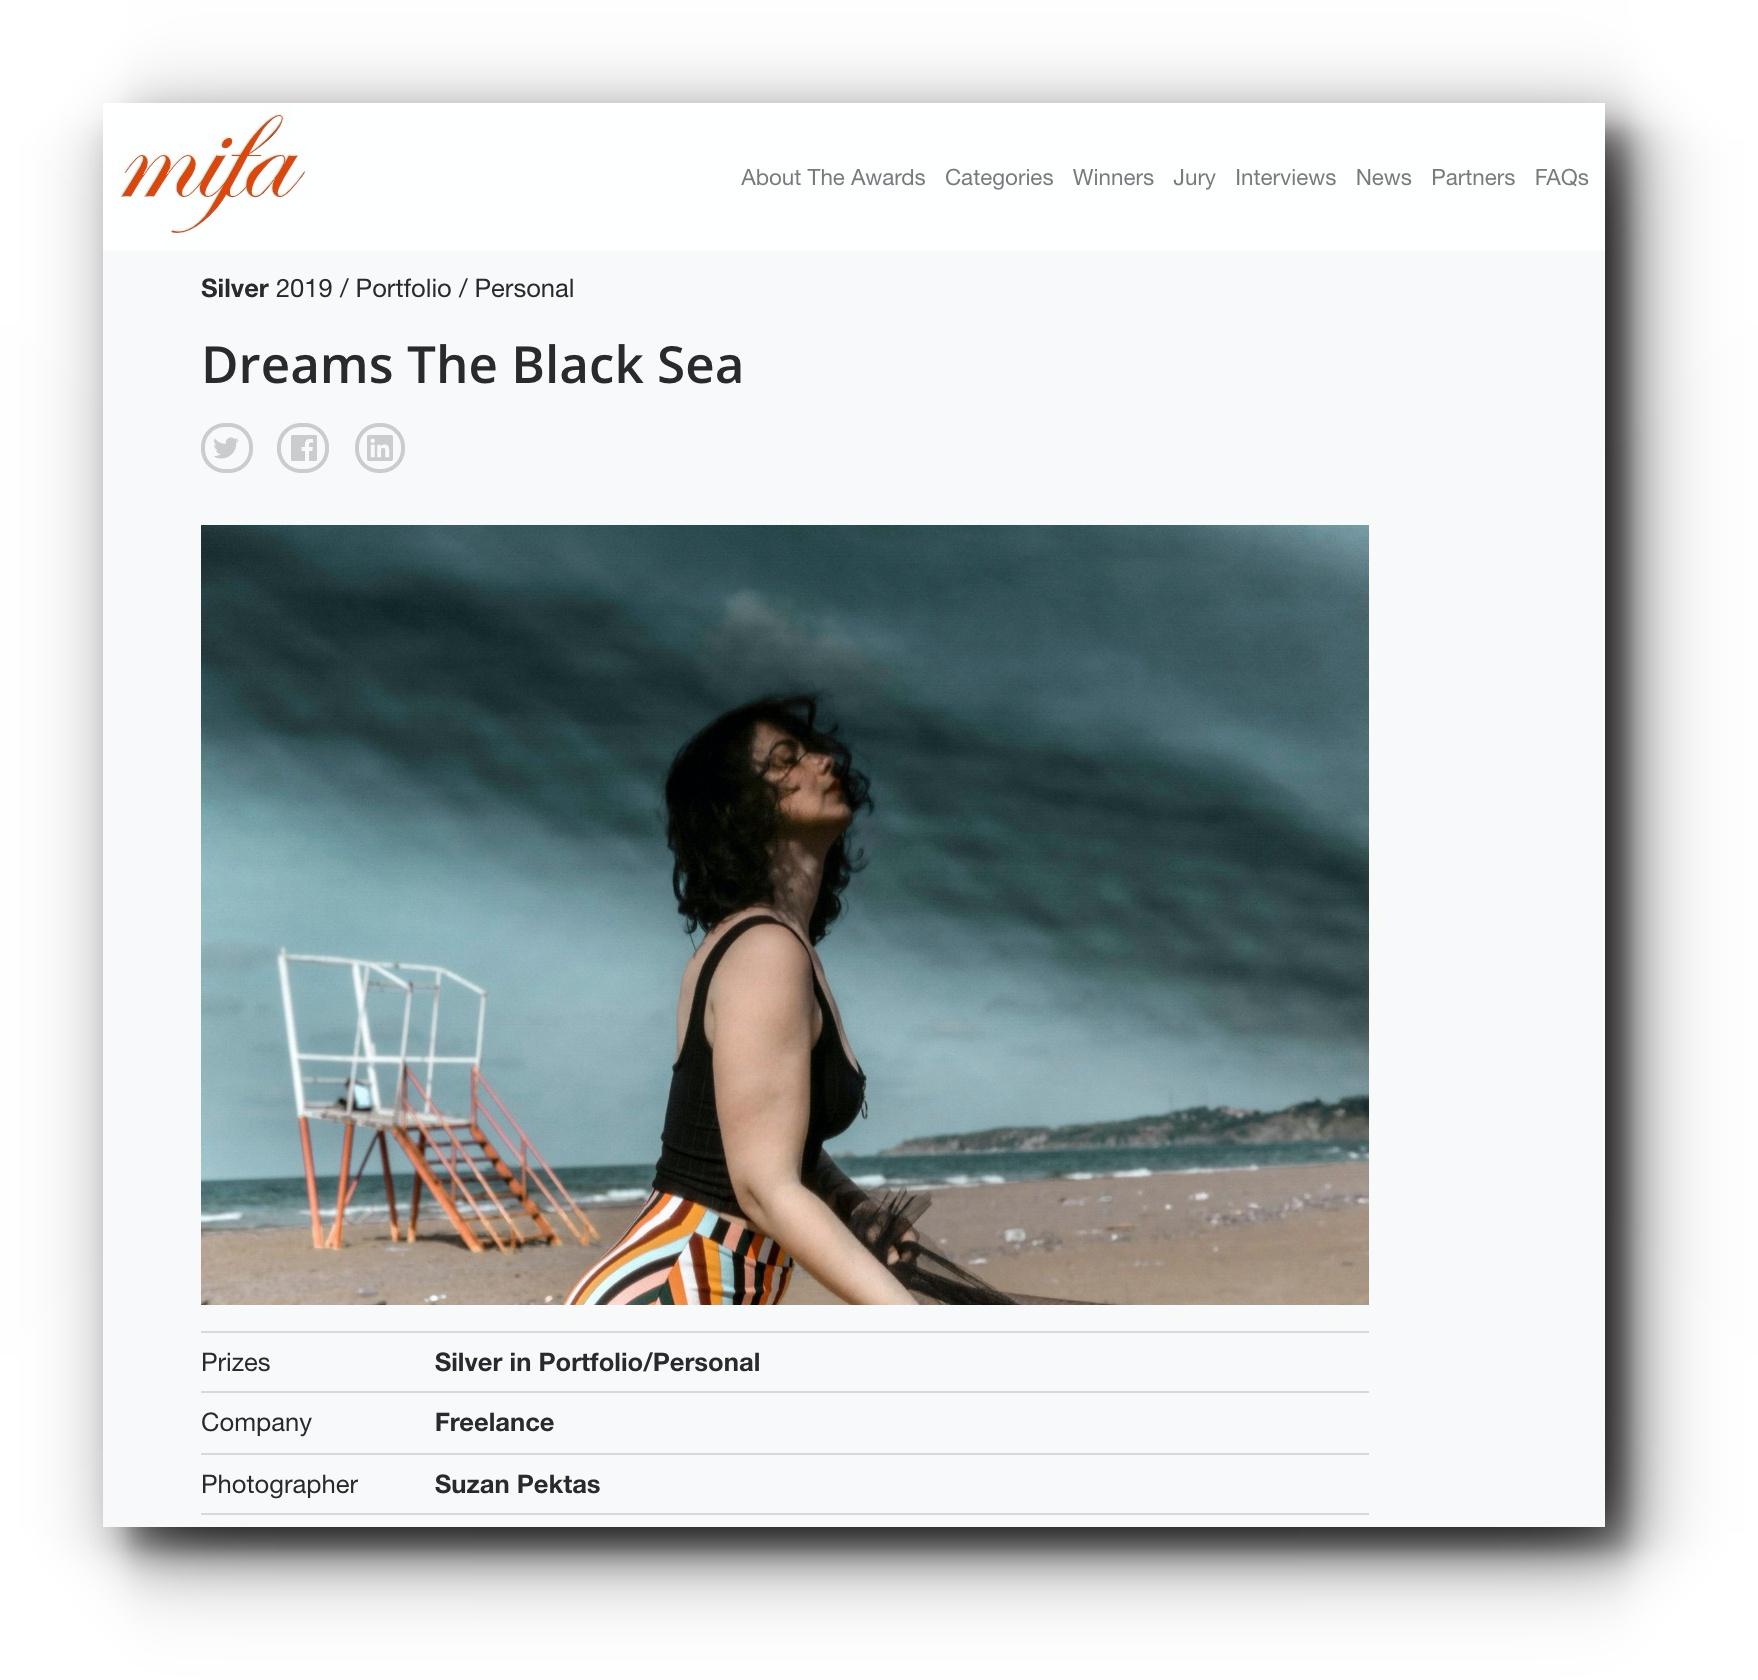 Dreams The Black Sea series received Silver Medal in Portfolio/Personal in MIFA 2019 - June, 2019